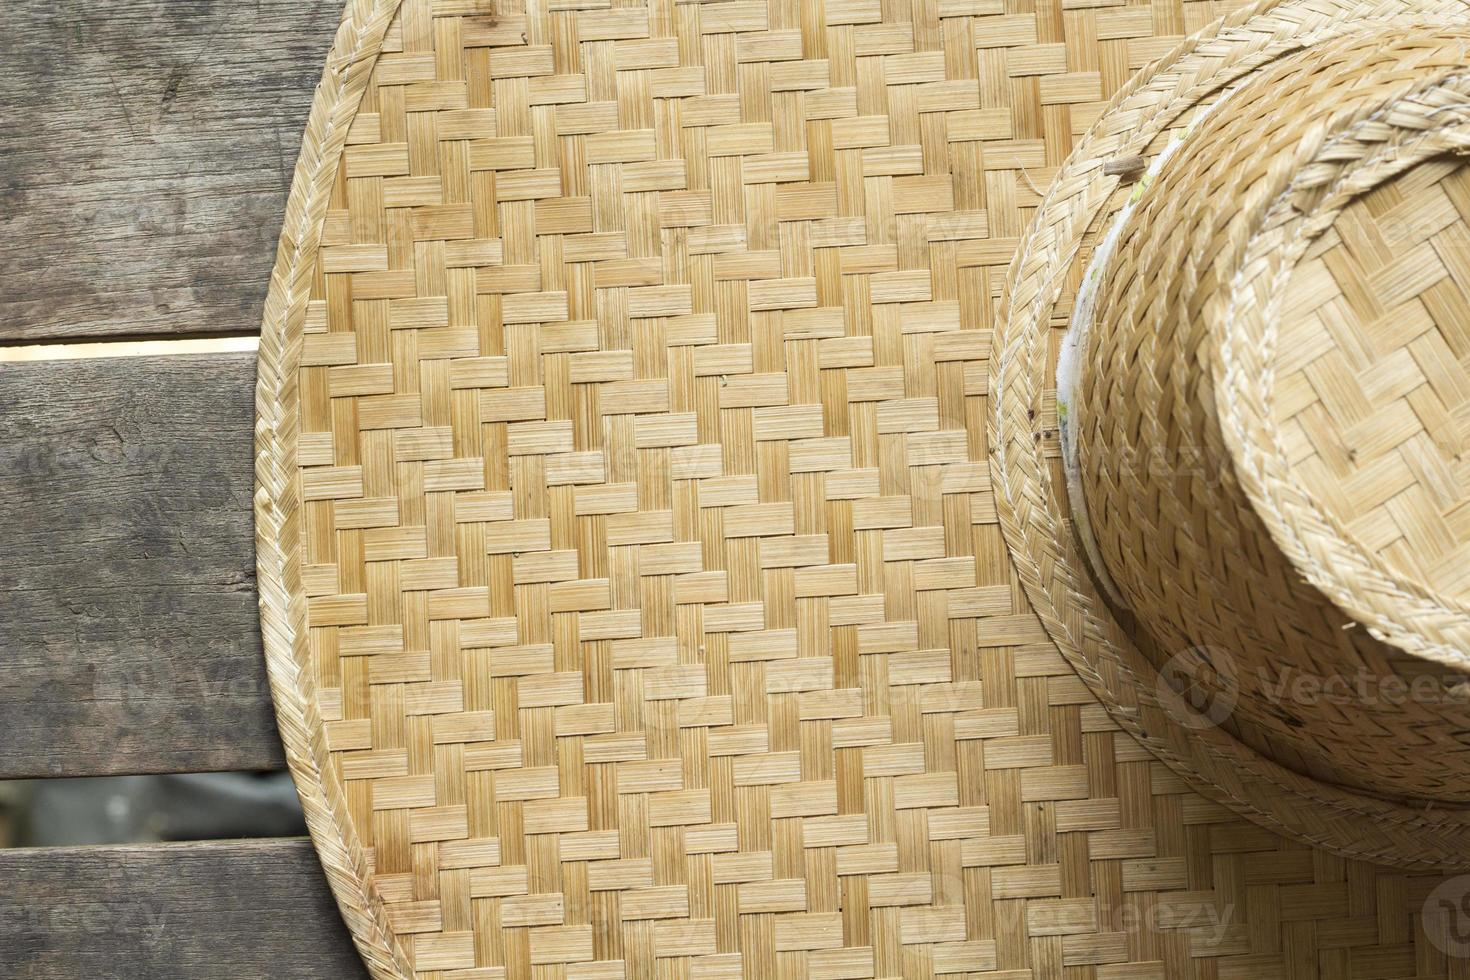 bambu hantverk bakgrund foto